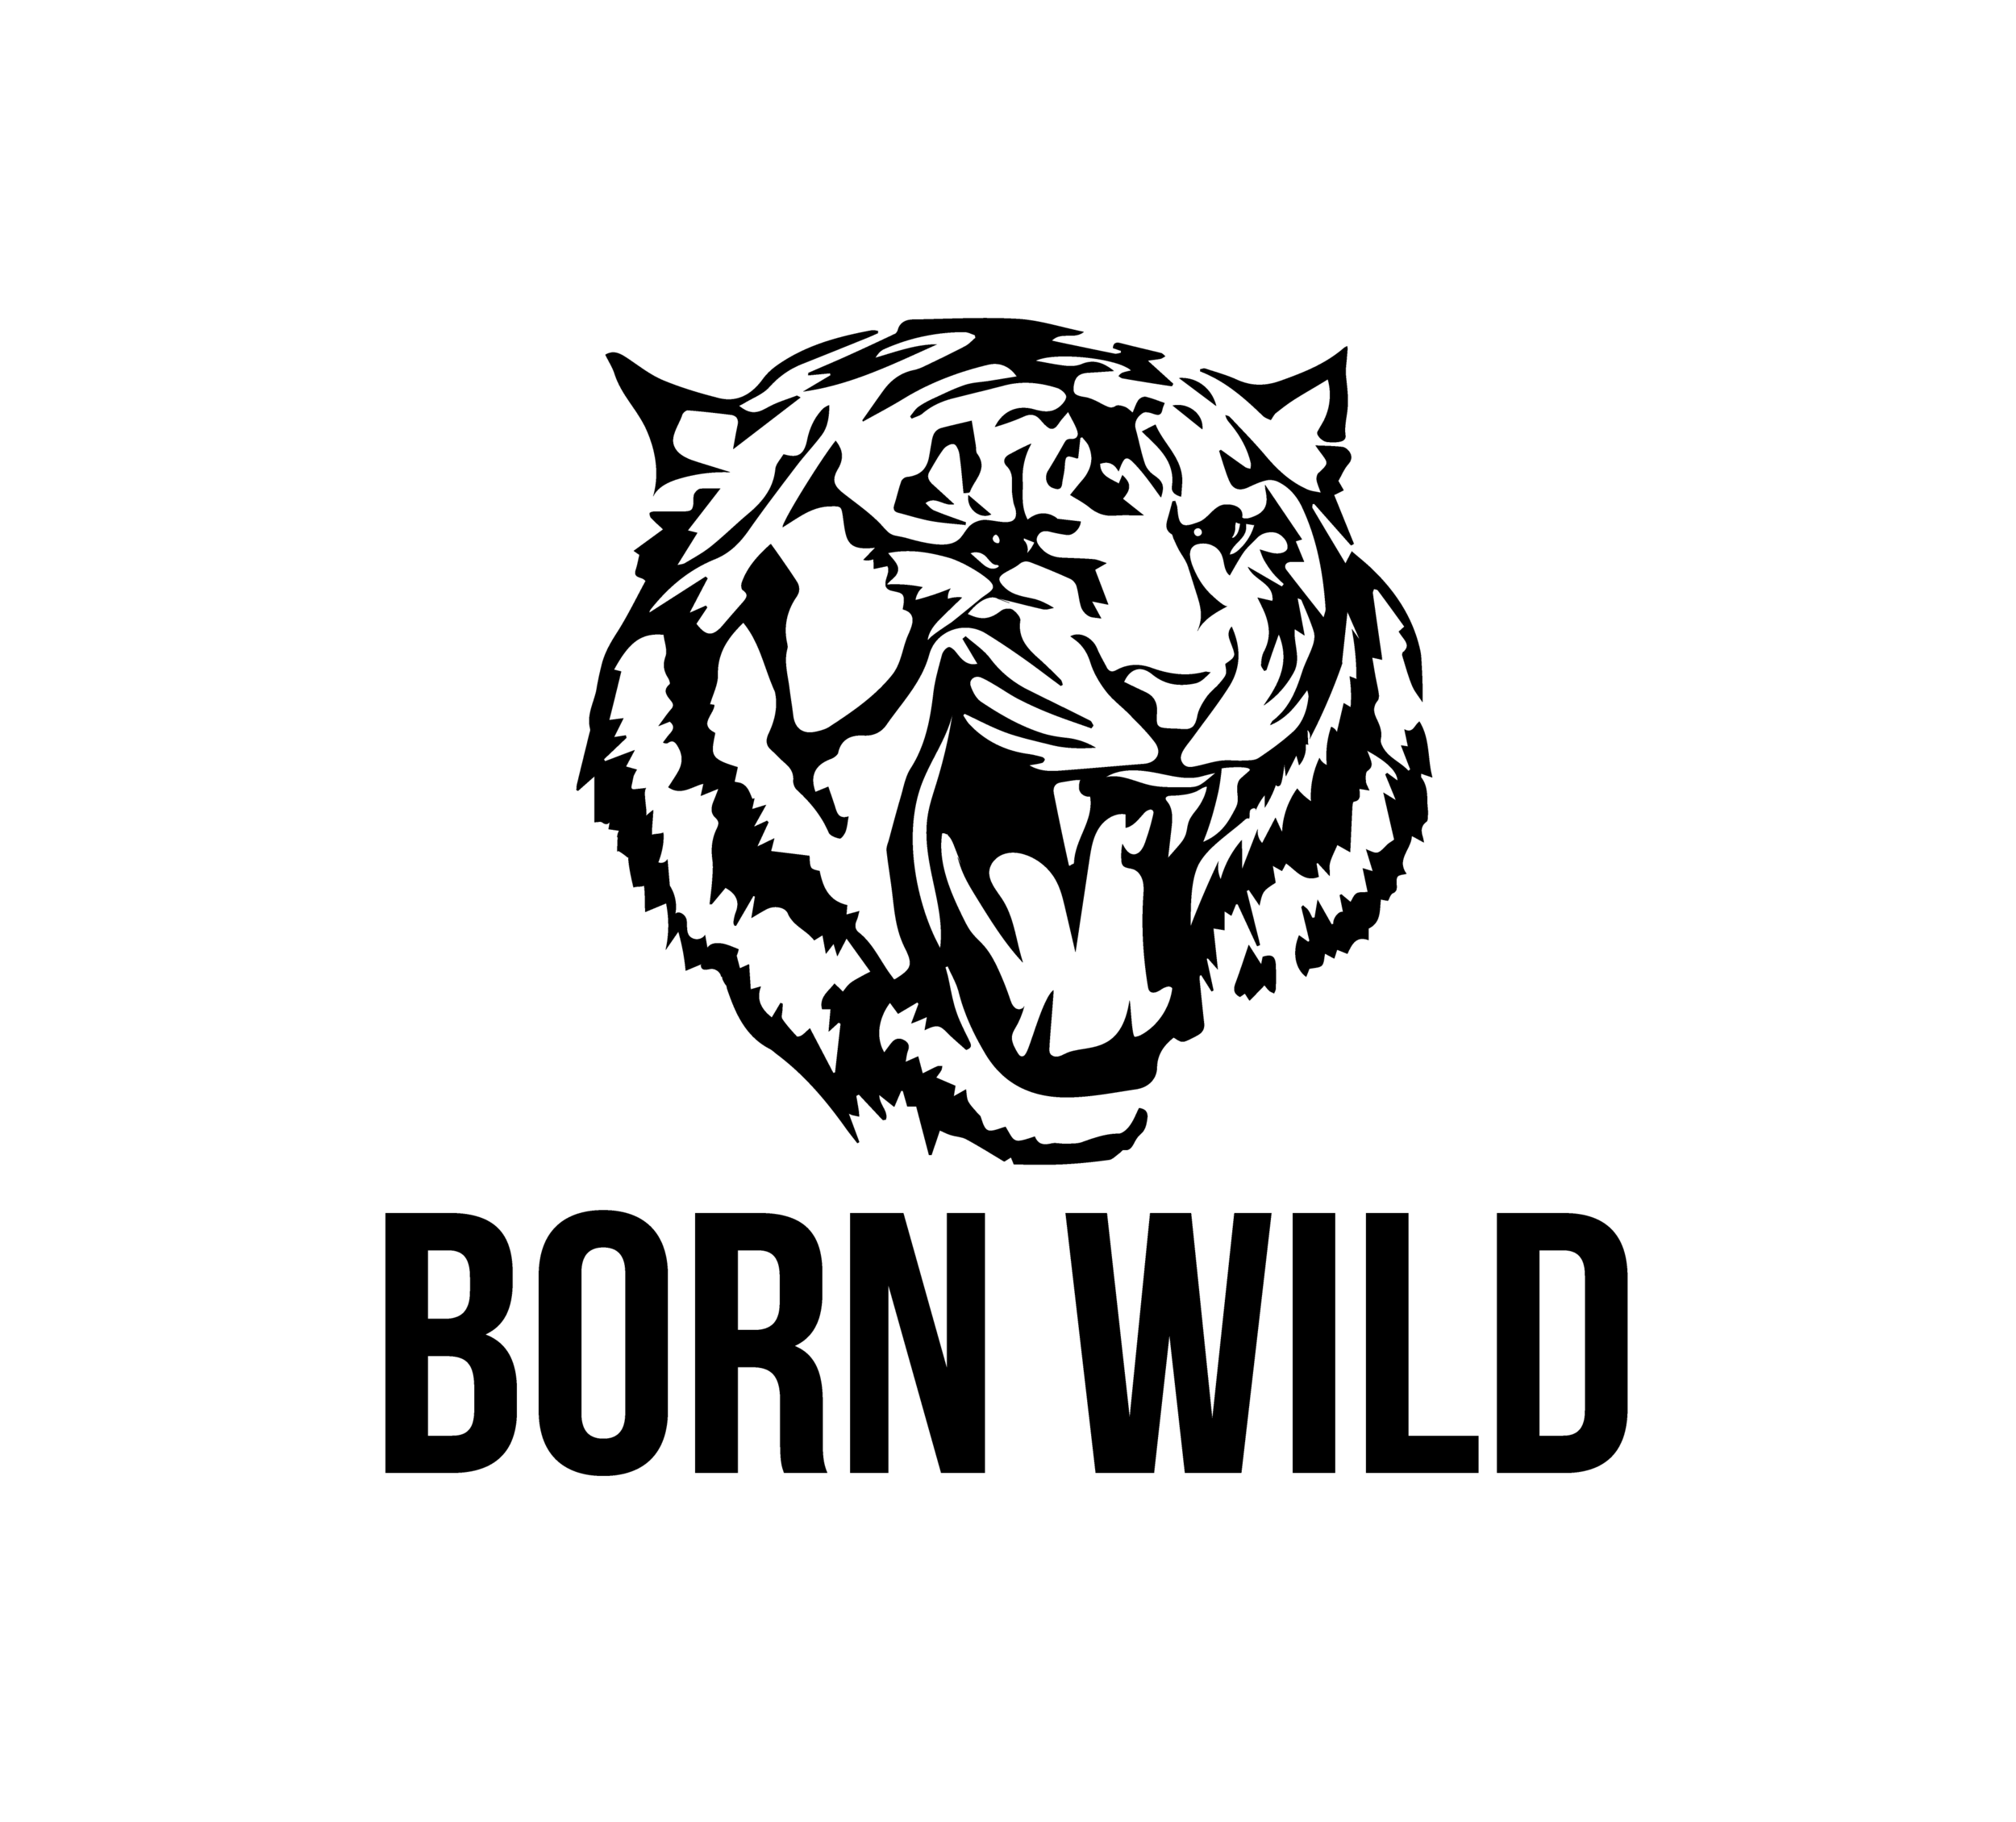 Tigerhead-logo-black-bigTransparent.png